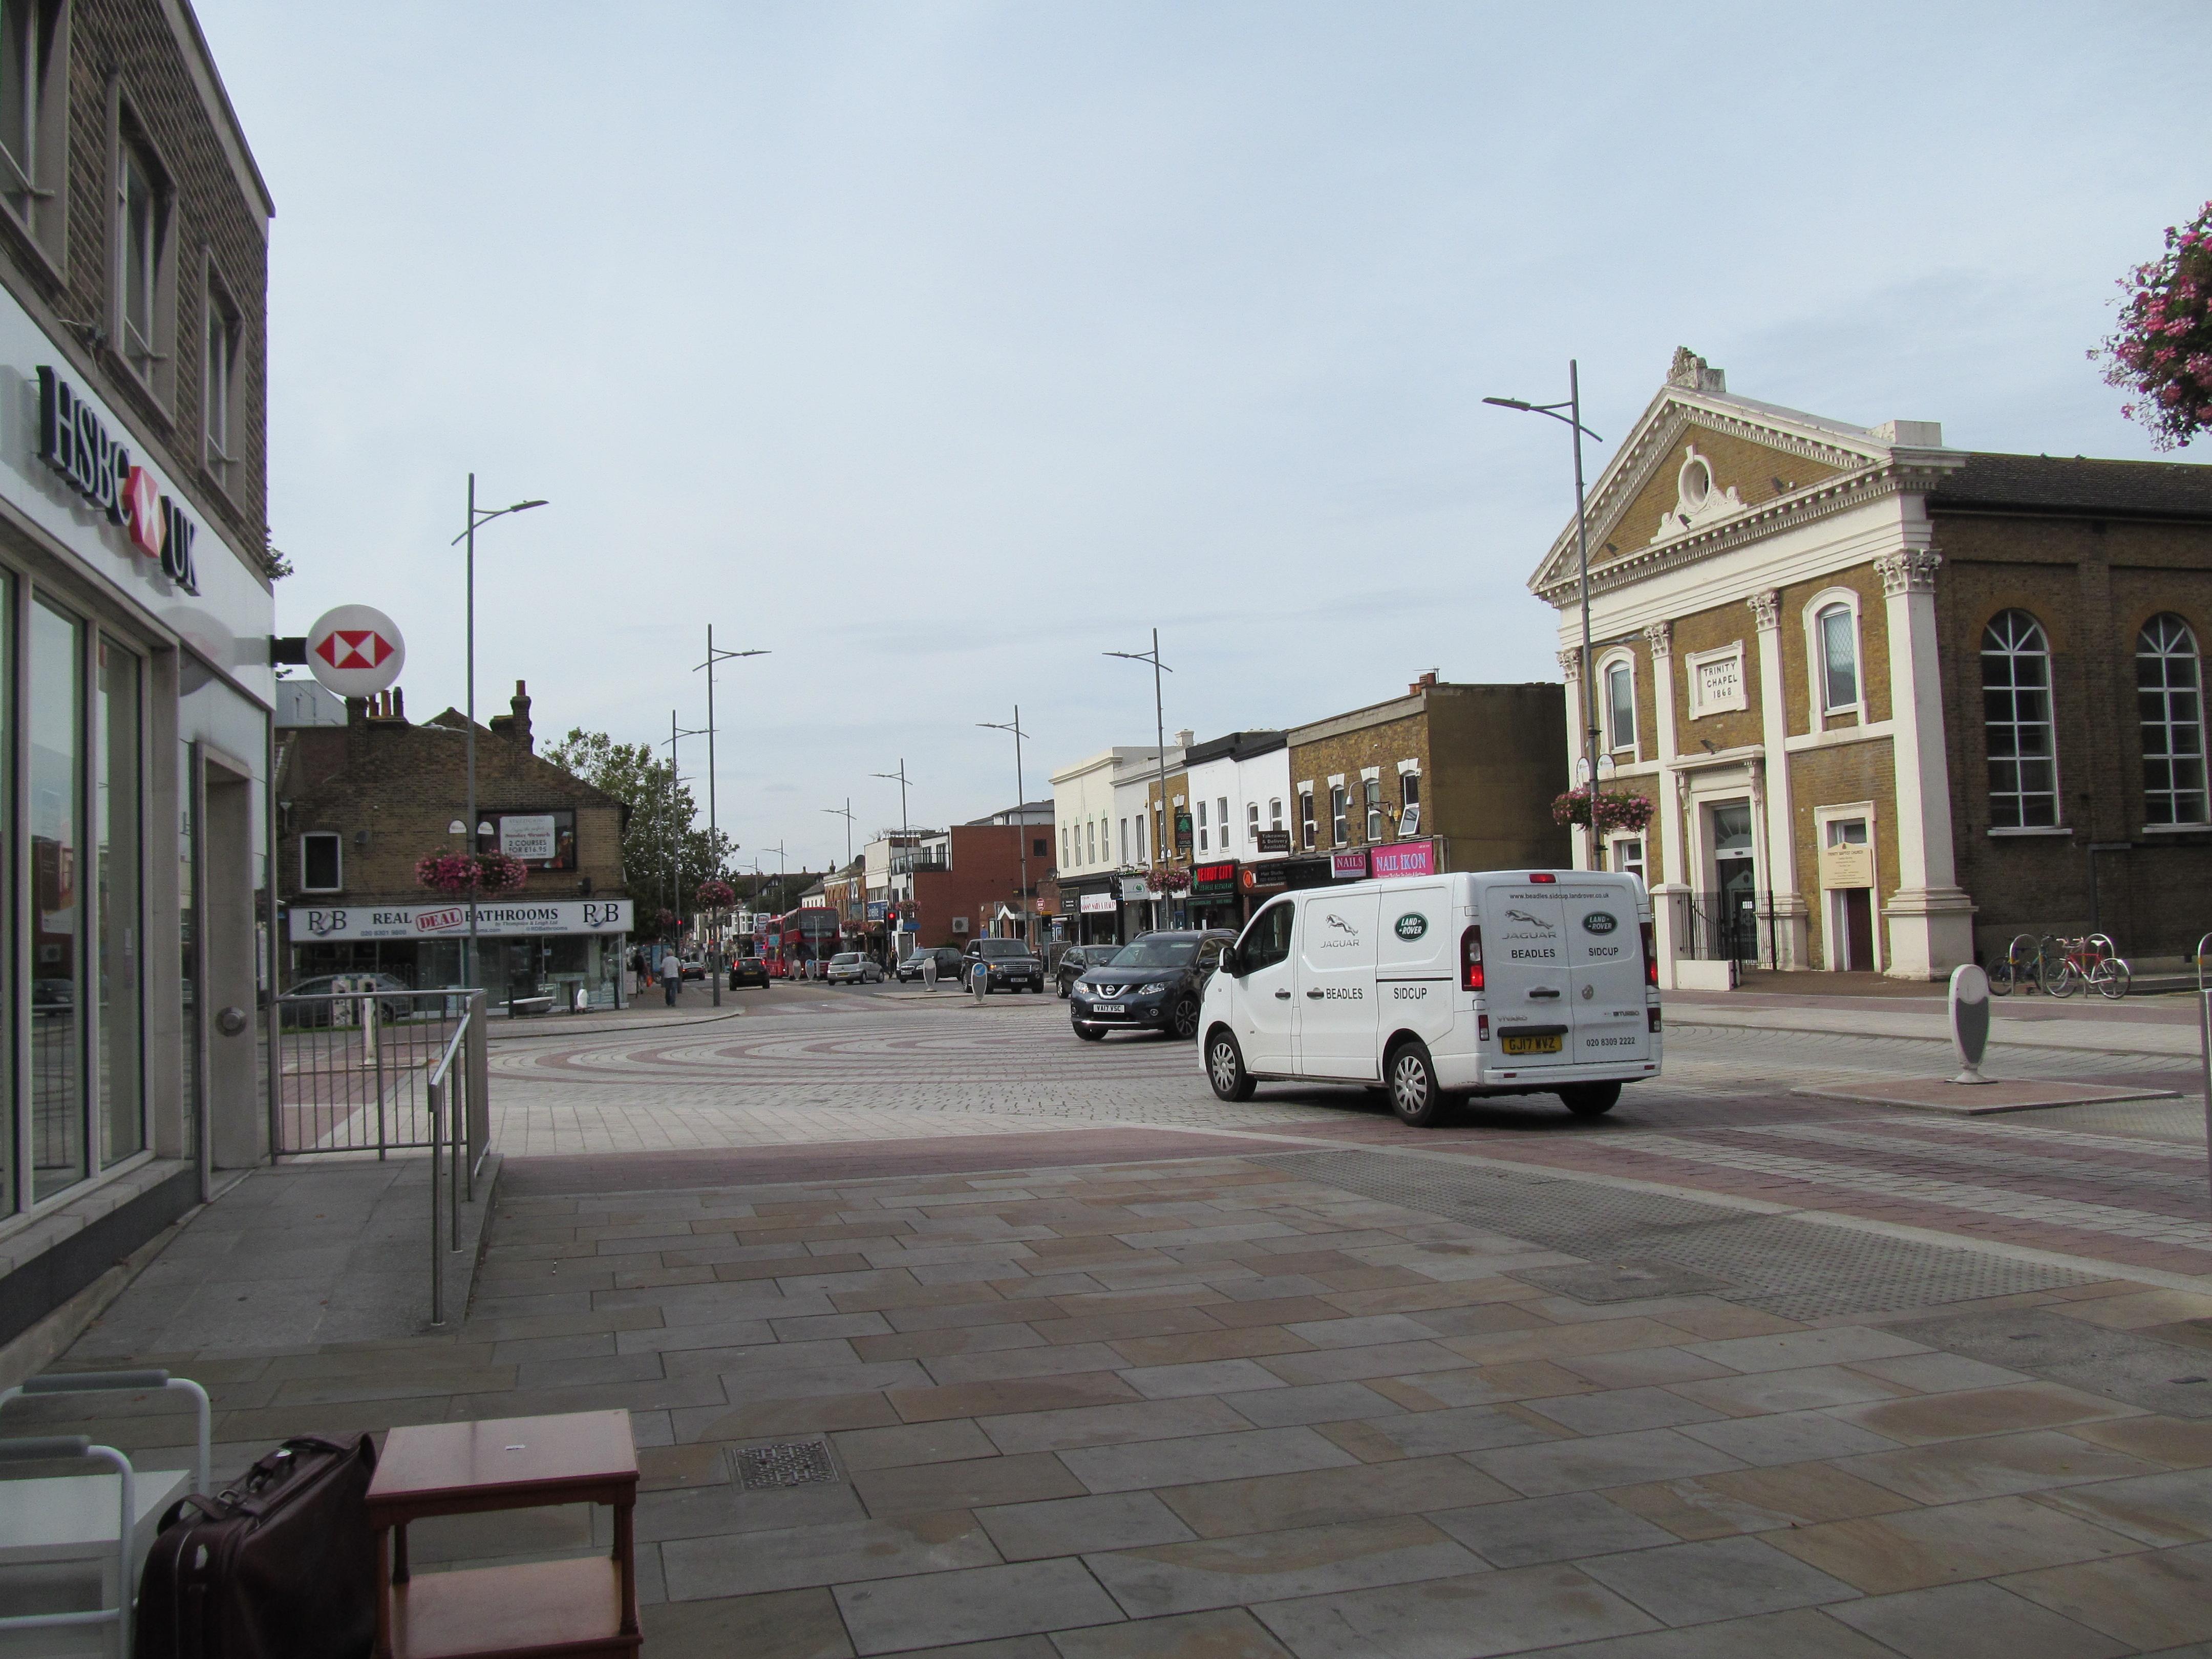 Bexley council given £700,000 to fix potholes